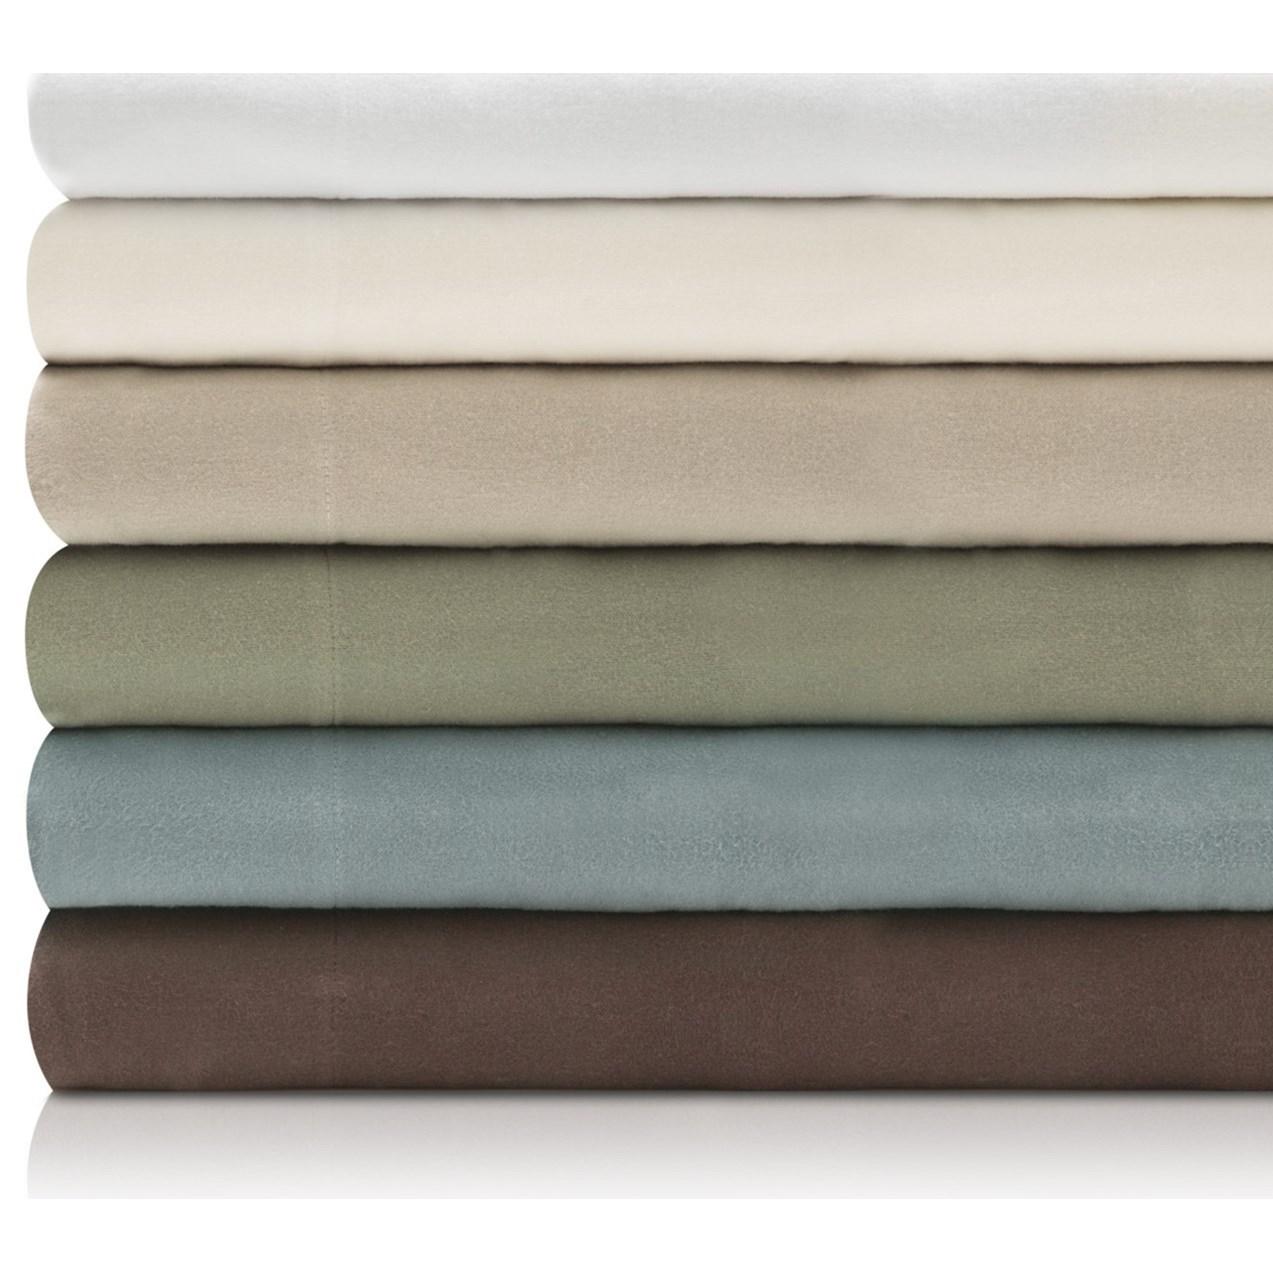 Malouf Portuguese Flannel King Woven™ Portuguese Flannel Sheet Set - Item Number: WO19KKPNFS